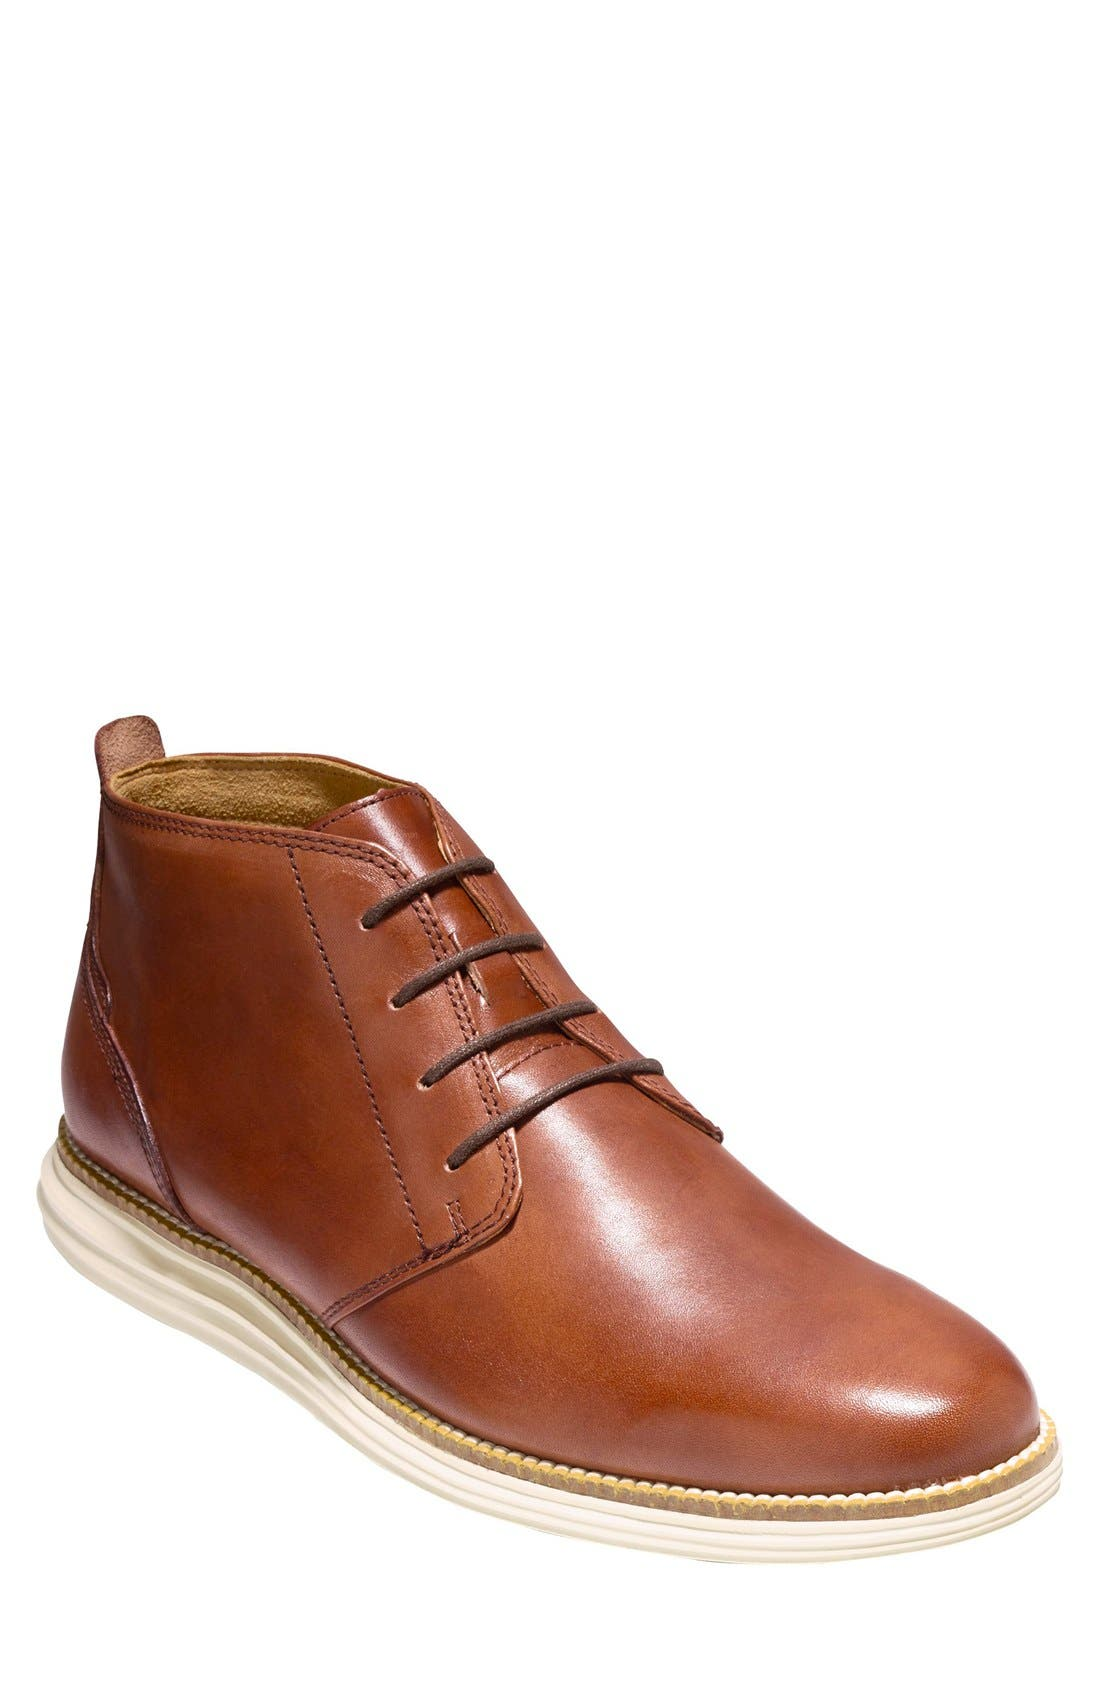 Alternate Image 1 Selected - Cole Haan 'Original Grand' Chukka Boot (Men)